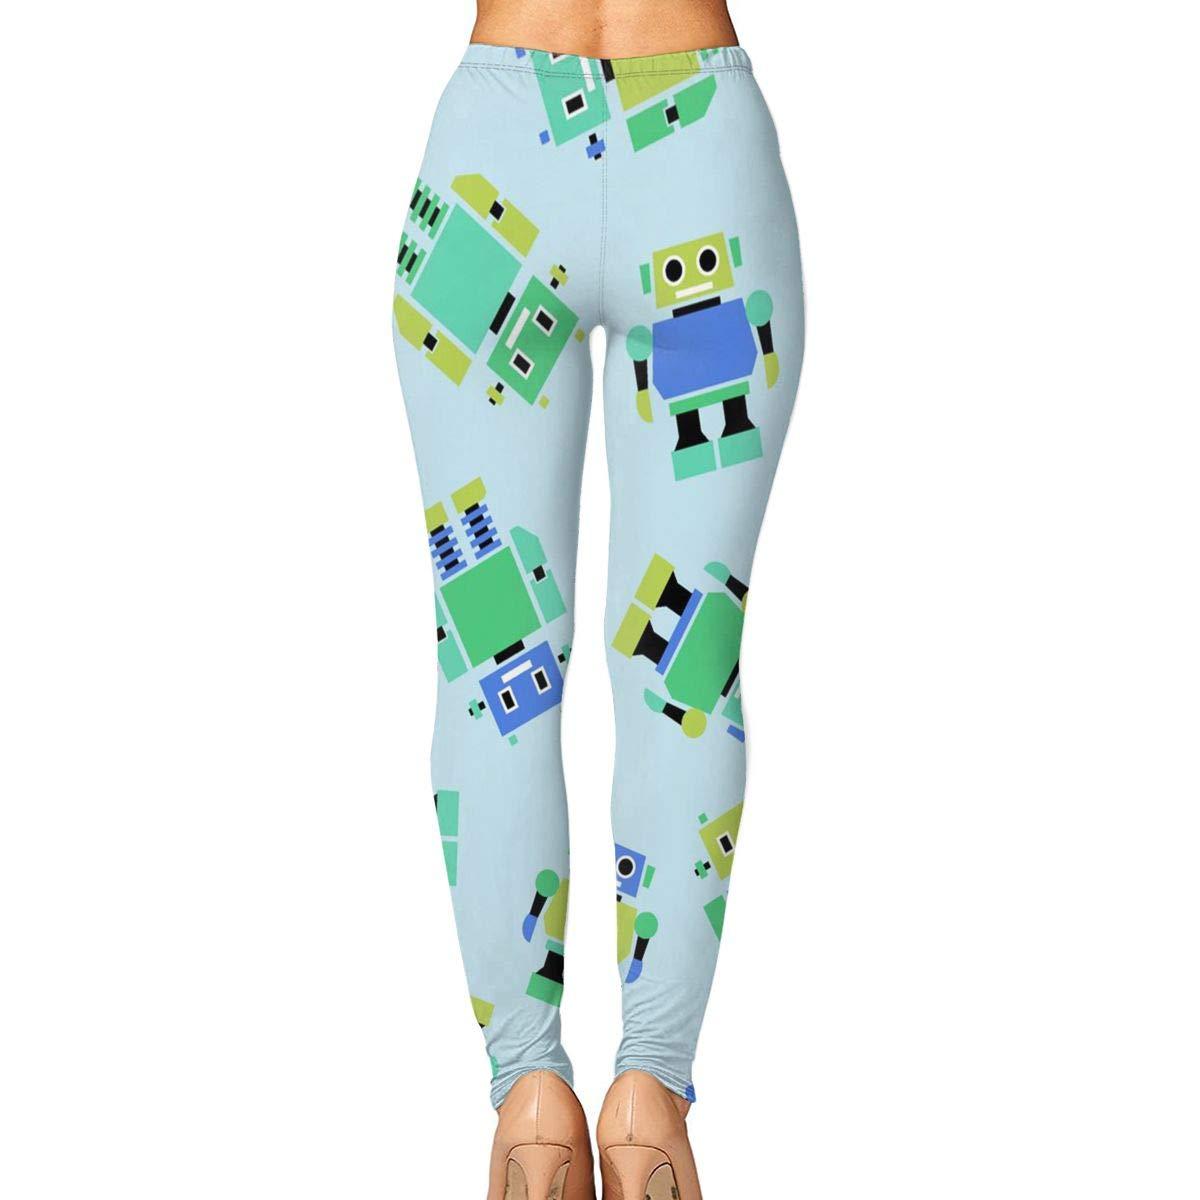 7cc7b6253f8a3 Amazon.com : KUAAAKE Yoga Pants Lovely Robot Holiday Womens Fitness Power  Flex Yoga Pants Leggings : Sports & Outdoors